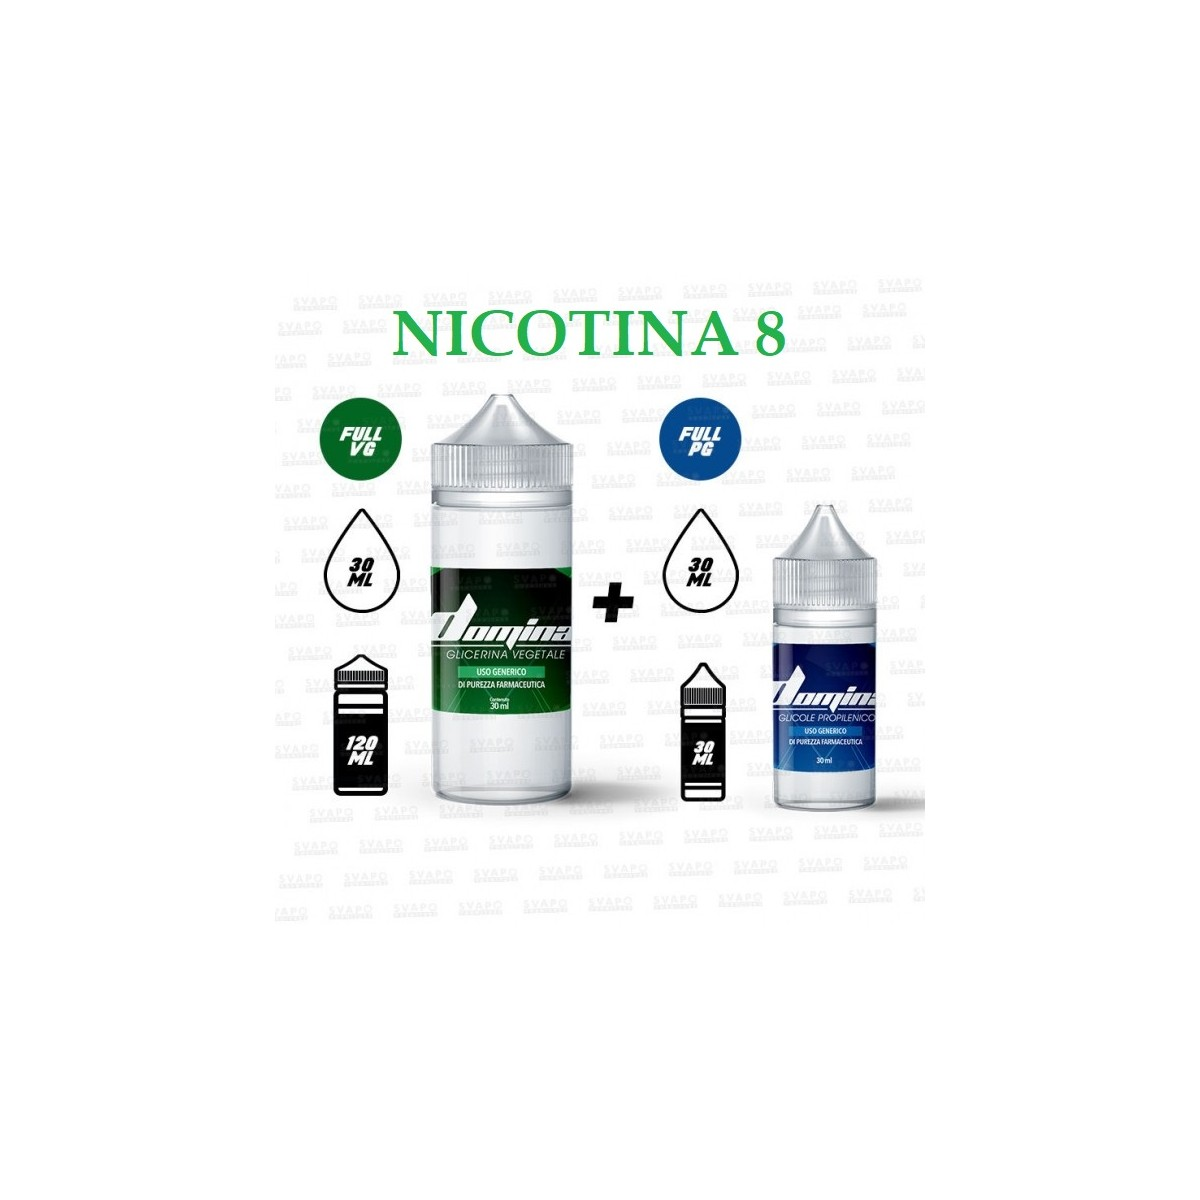 Bundle - Domina 100 Series 50/50 - 8mg/ml Nic